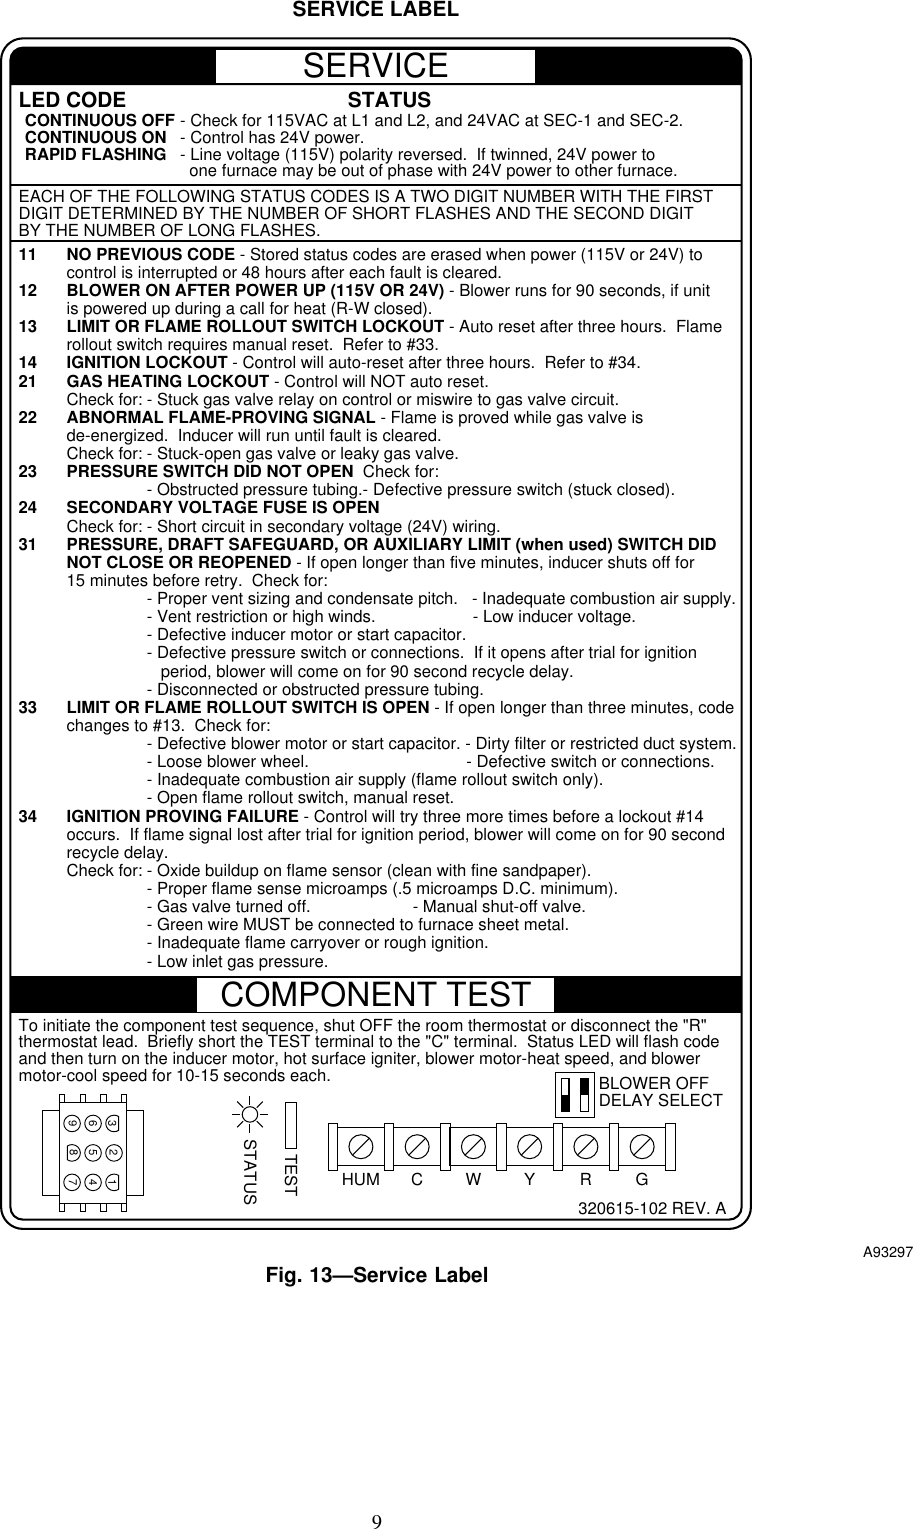 Carrier Series 131 58Pav Users Manual